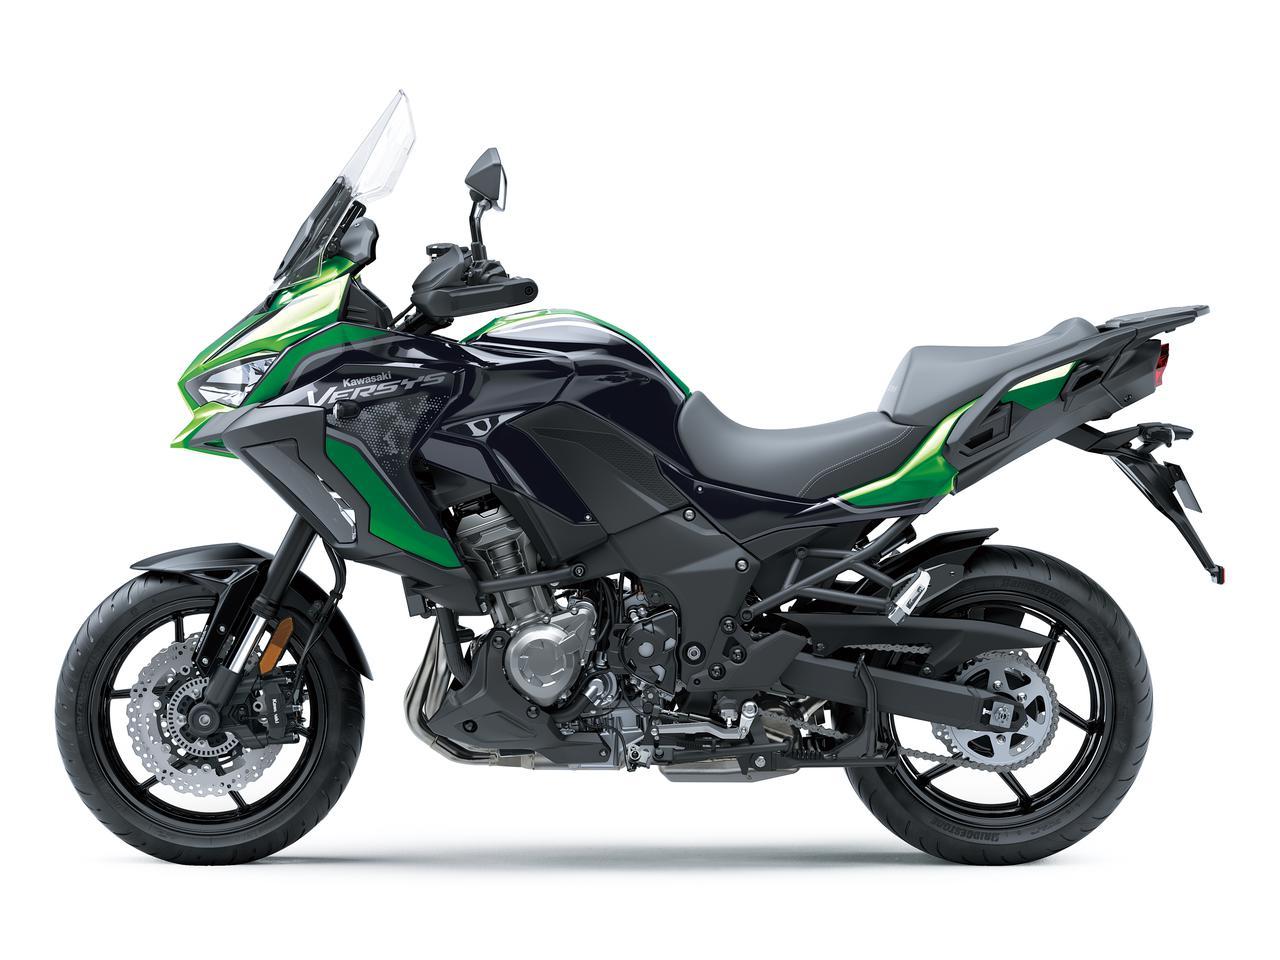 Images : 1番目の画像 - 写真をもっと見る! カワサキ「ヴェルシス1000S」(2021年モデル・欧州仕様車) - LAWRENCE - Motorcycle x Cars + α = Your Life.